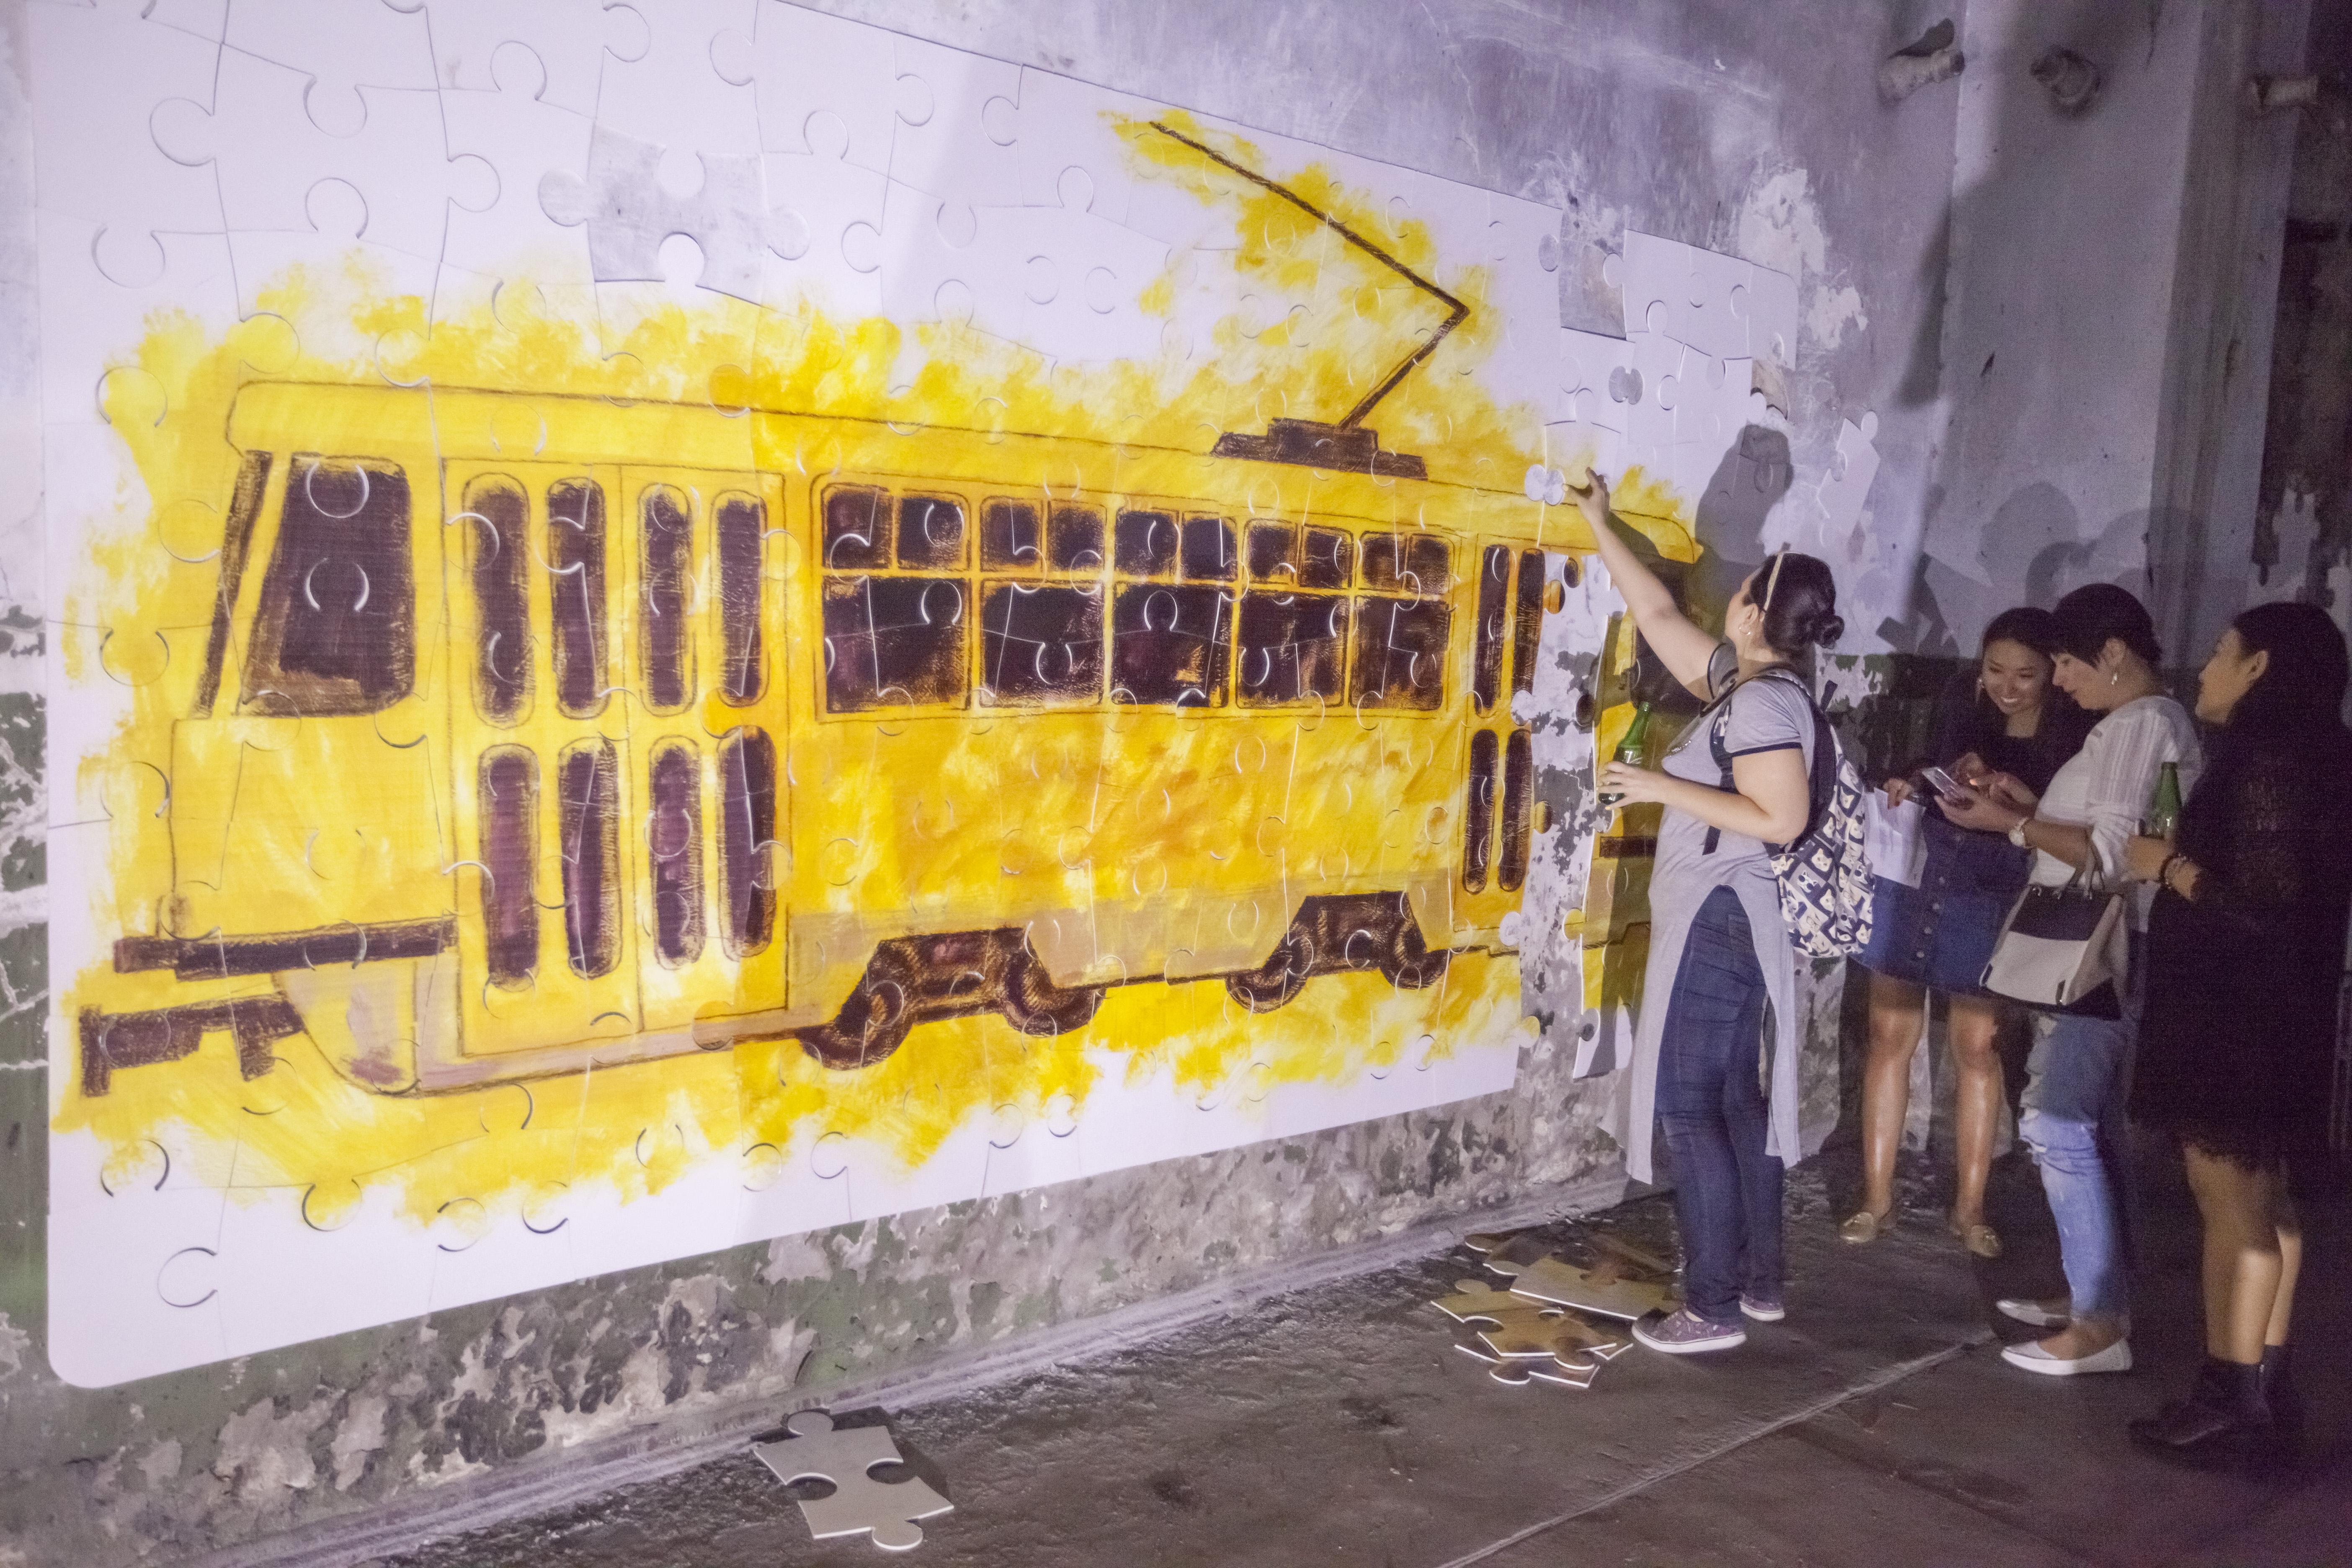 Tram_Depot_Opening (10)